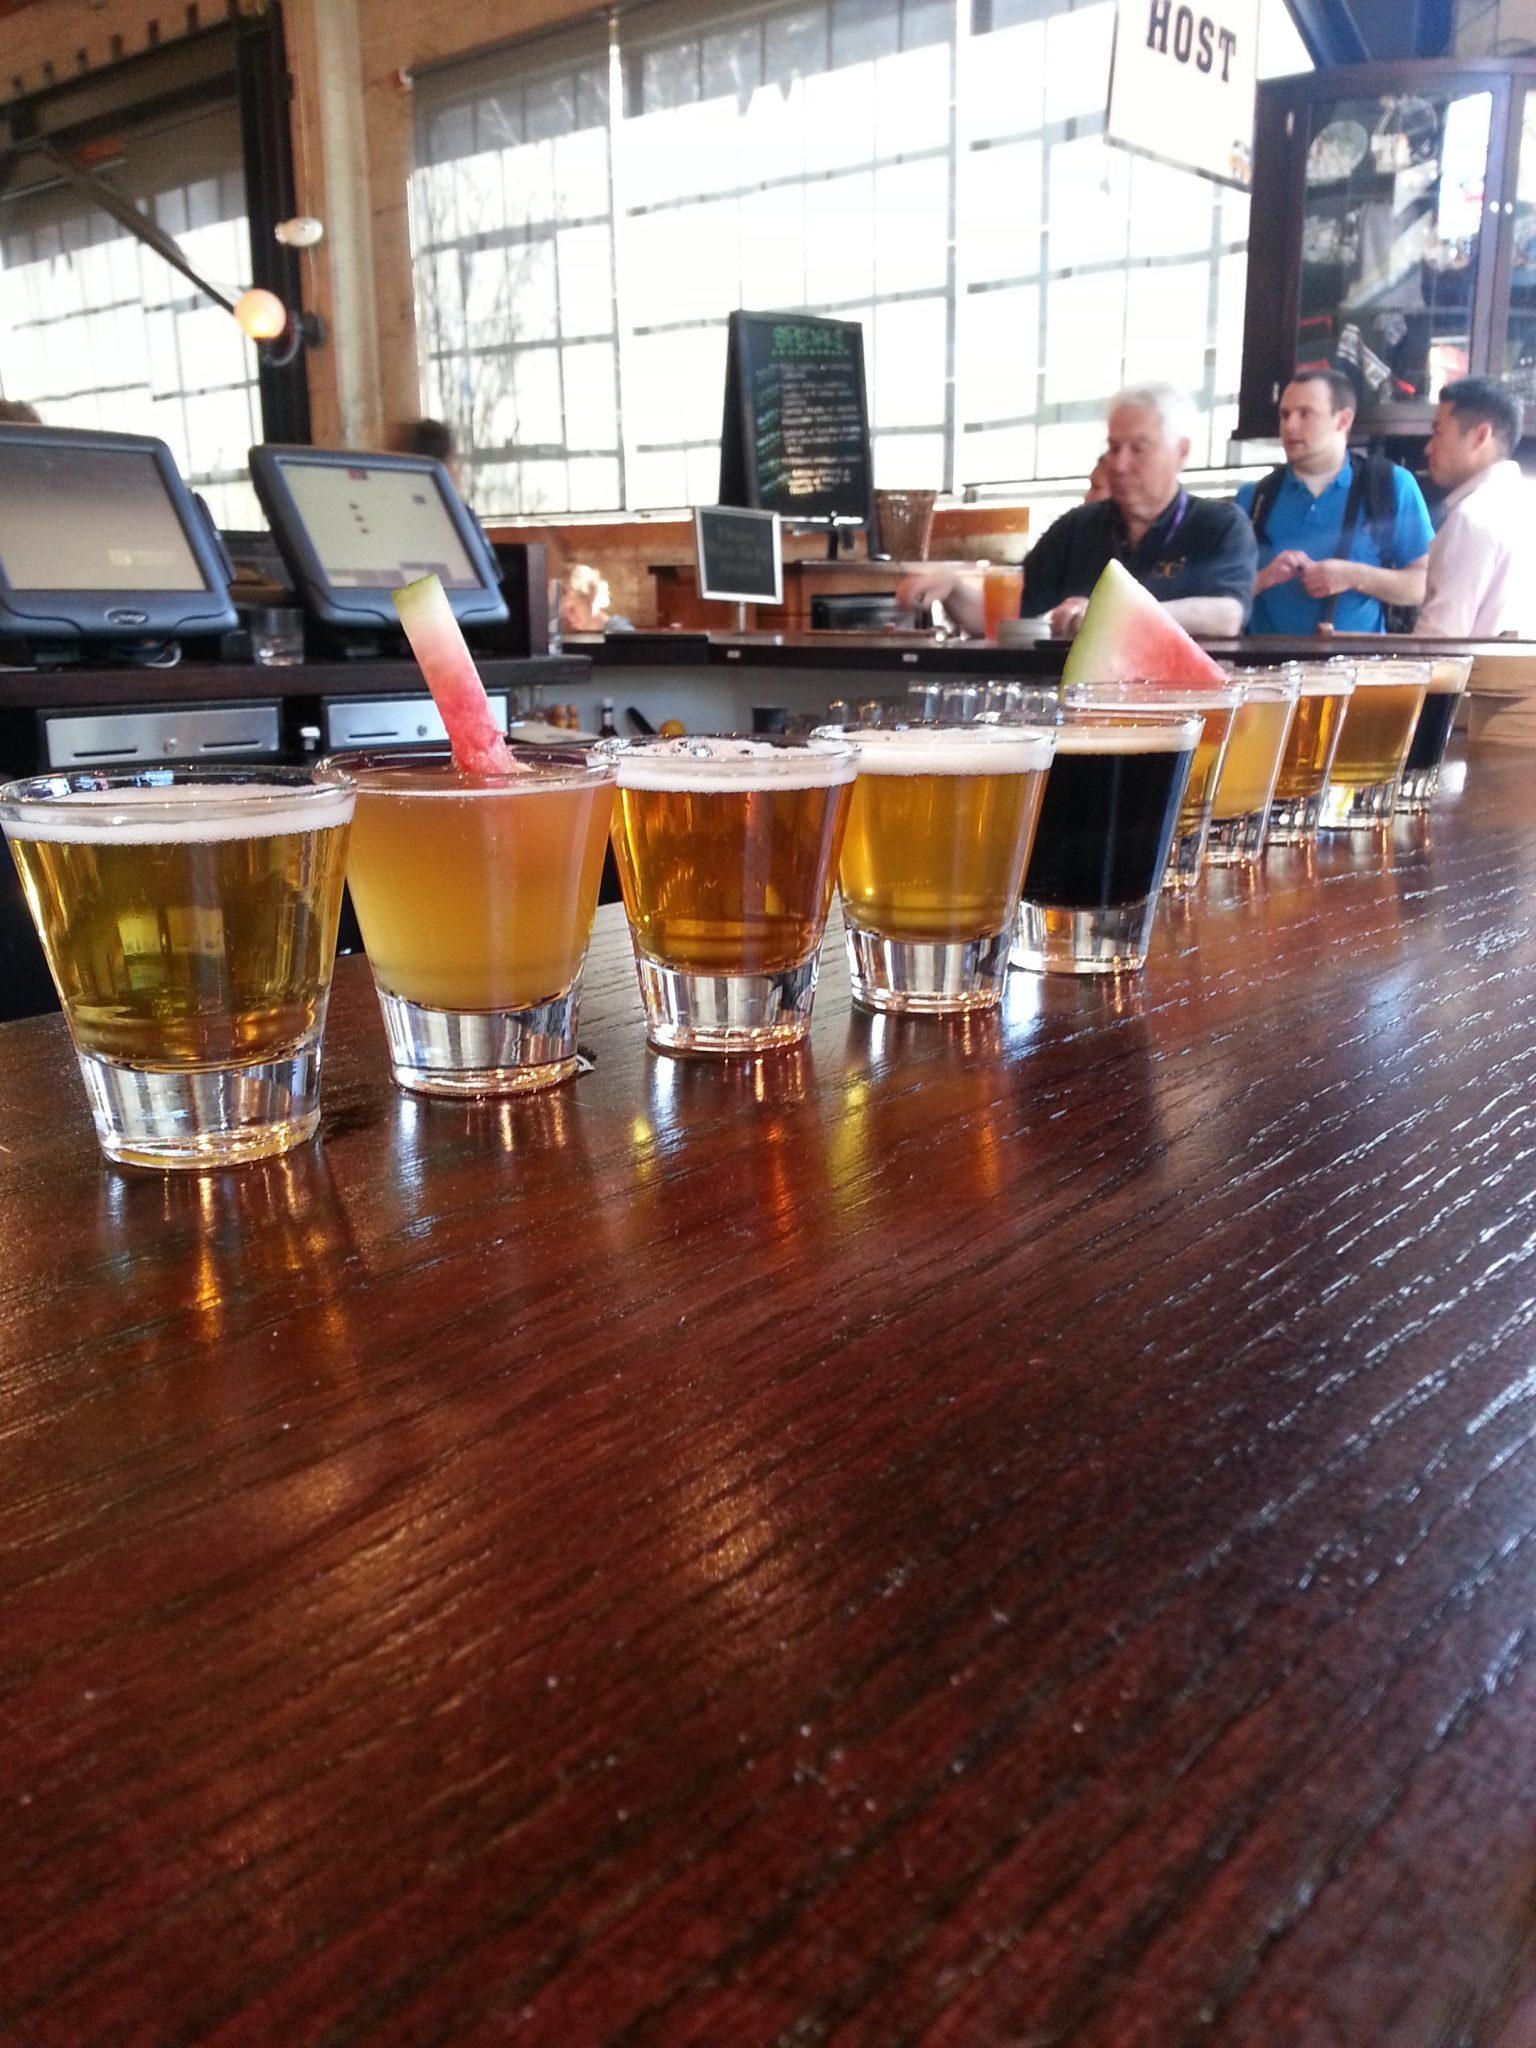 21st Amendment Brewing - San Francisco, California - top 10 beers in California